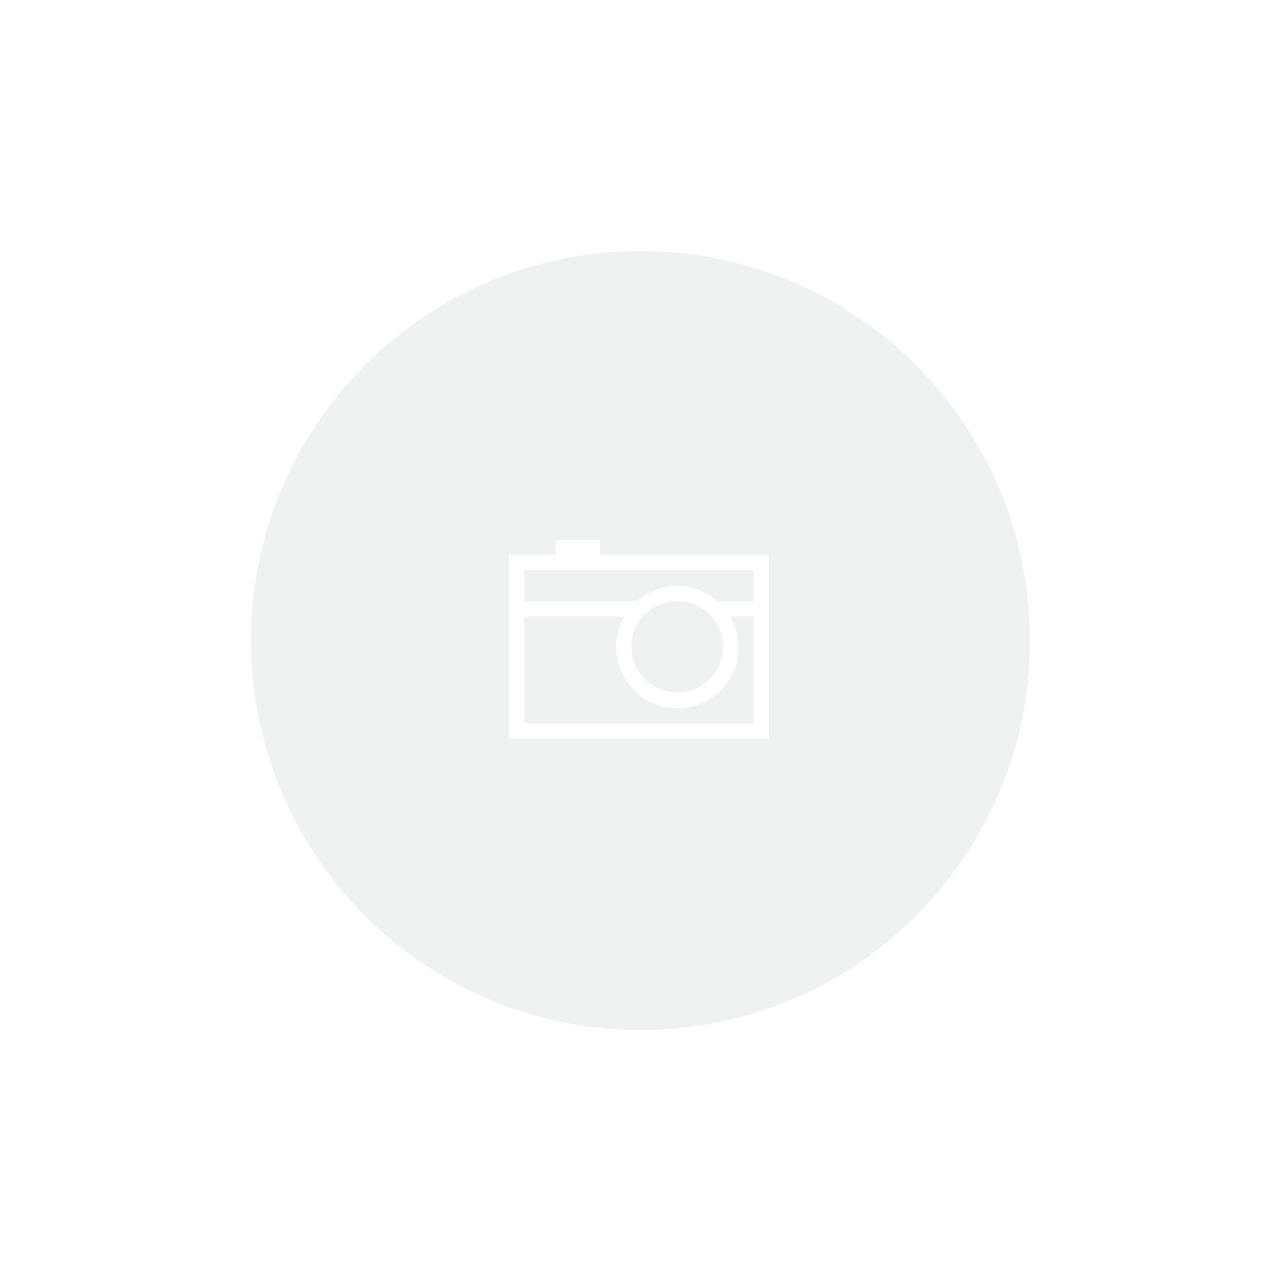 Memória Geil Evo X Black 4GB D Memória Geil Evo X Black 4GB DDR4 2400MHz (1x4GB) RGB LED -